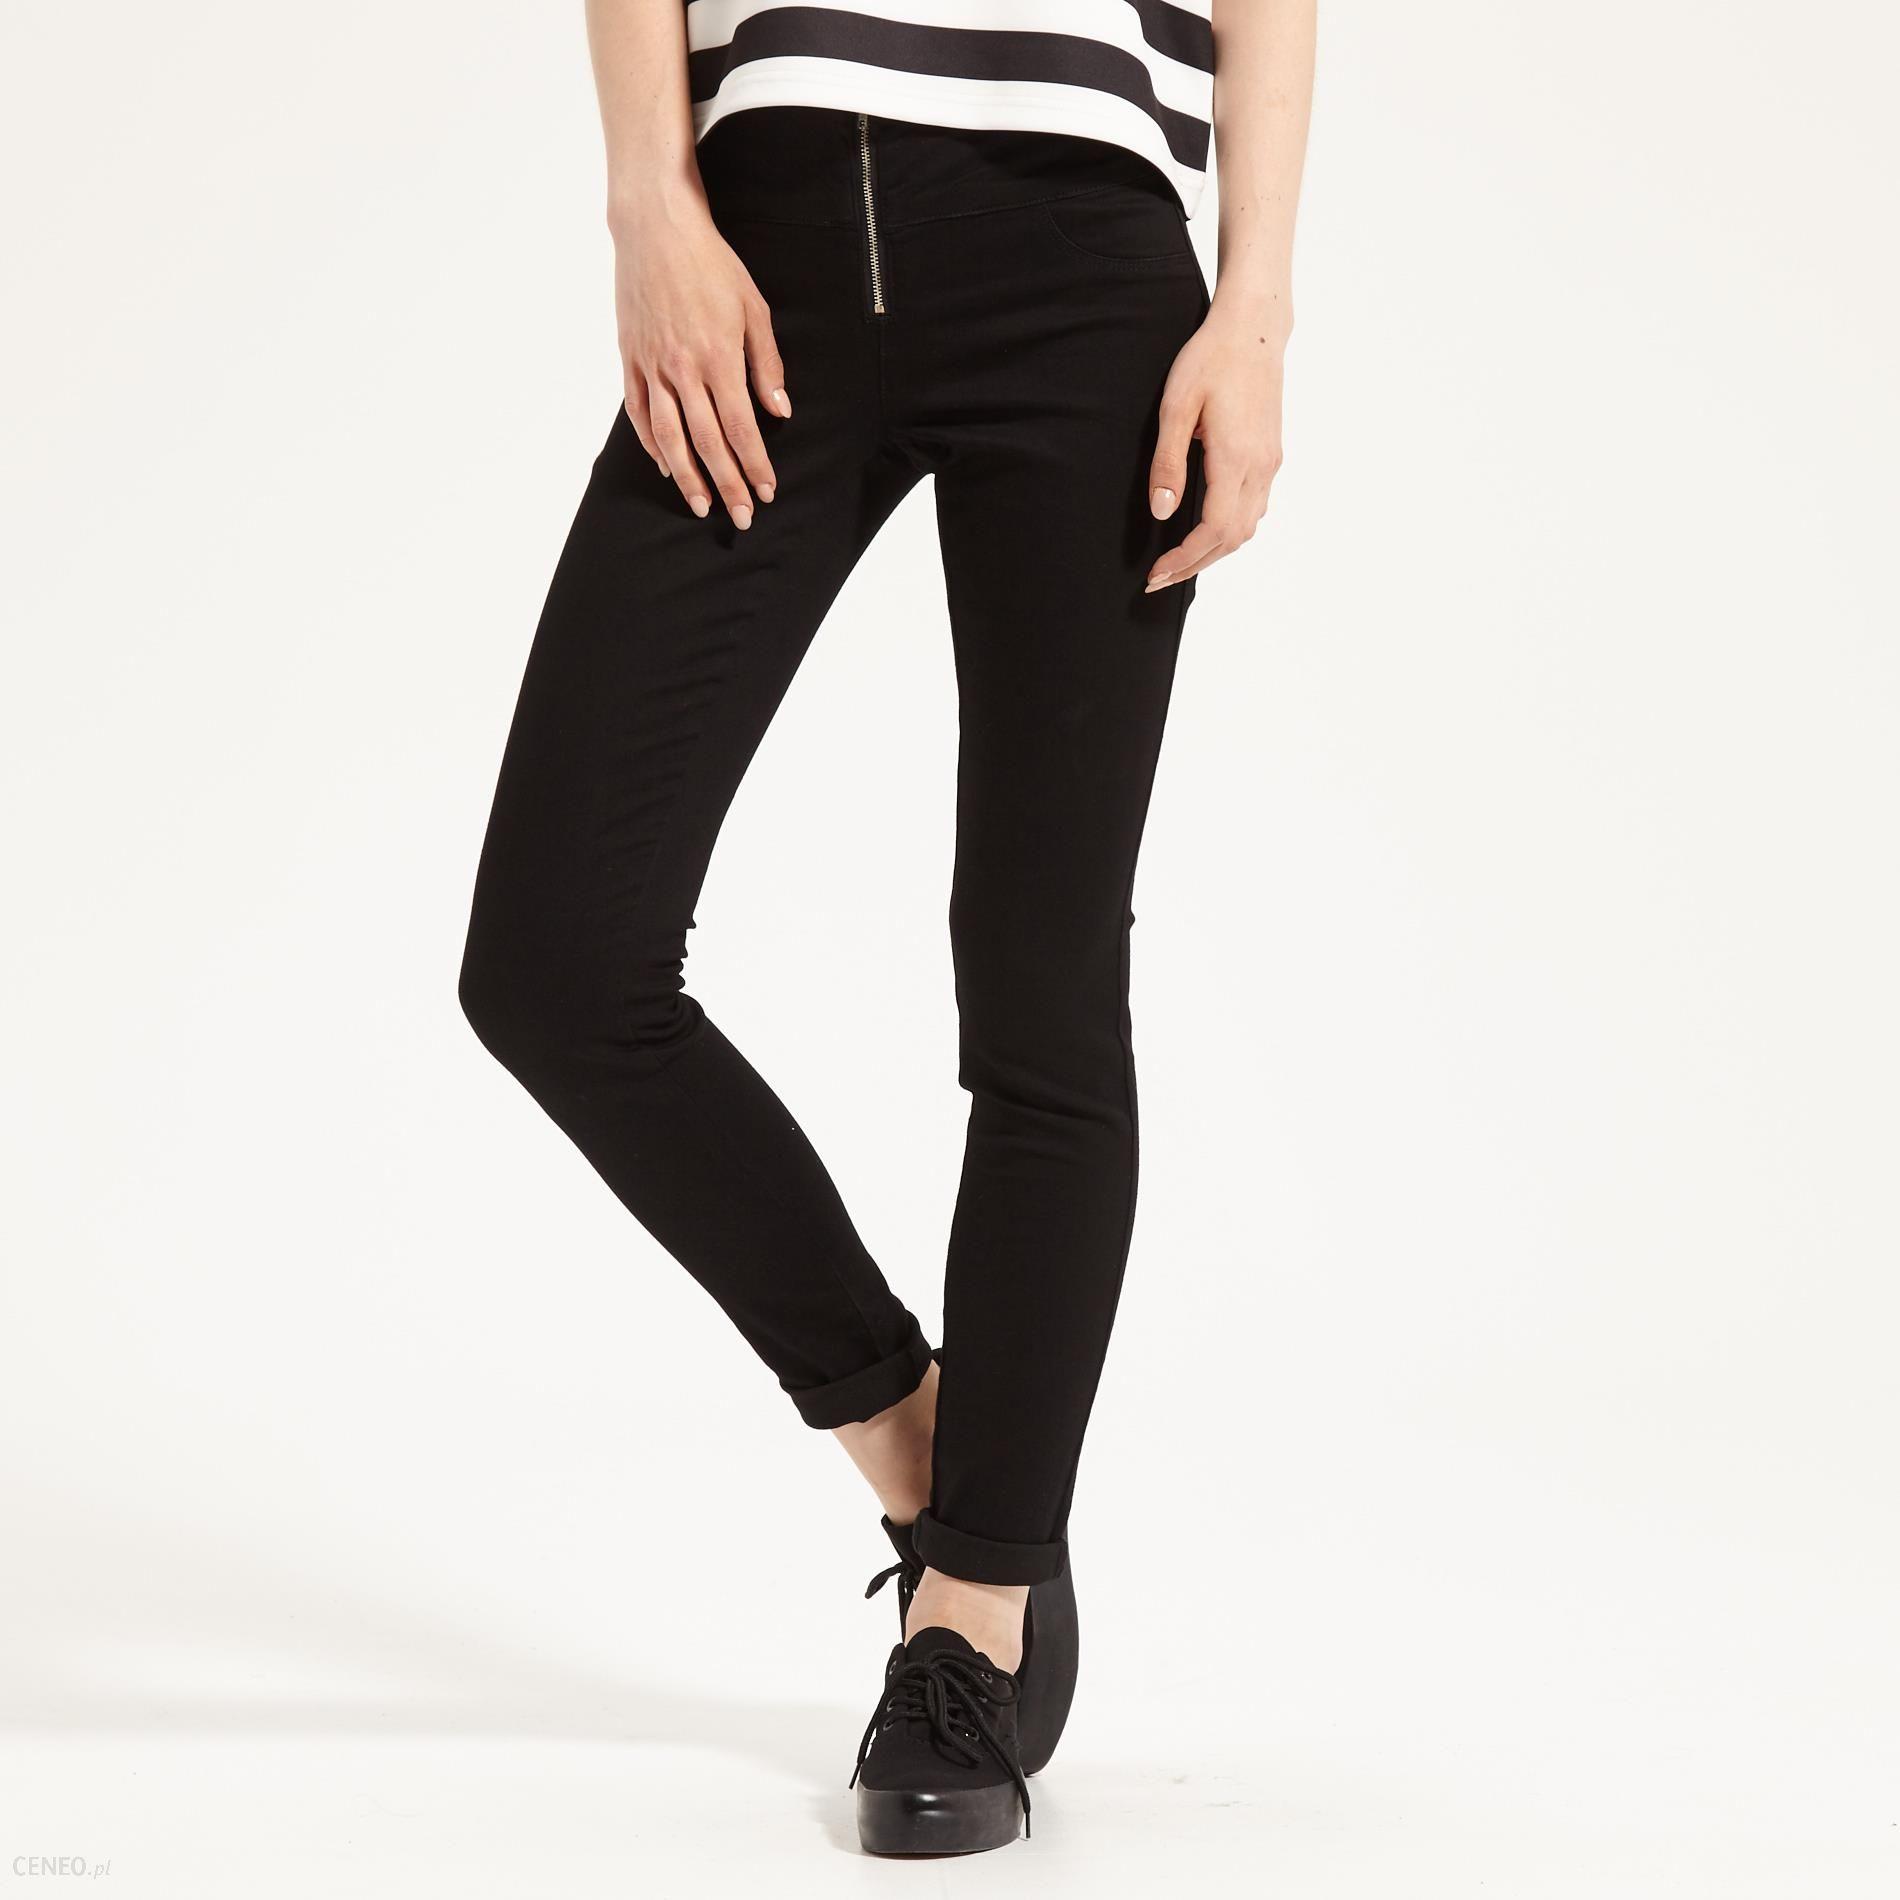 Sinsay Spodnie z wysokim stanem Czarny damska